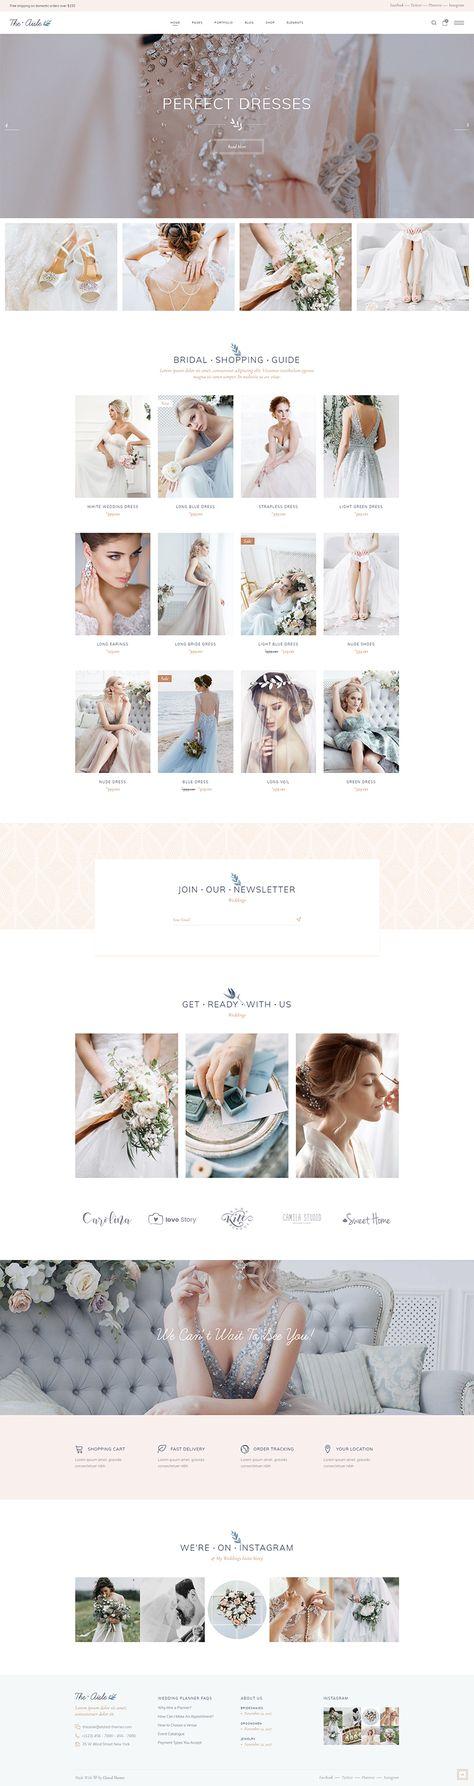 Build an amazing online presentation for your wedding shop with The Aisle WordPress theme!  #wordpress #webdesign #websitedesign #designinspiration #wedding #celebration #weddingplanner #weddingwebsite #weddinginspiration #weddingbusiness #weddingday #weddingphoto #feminine #elegant